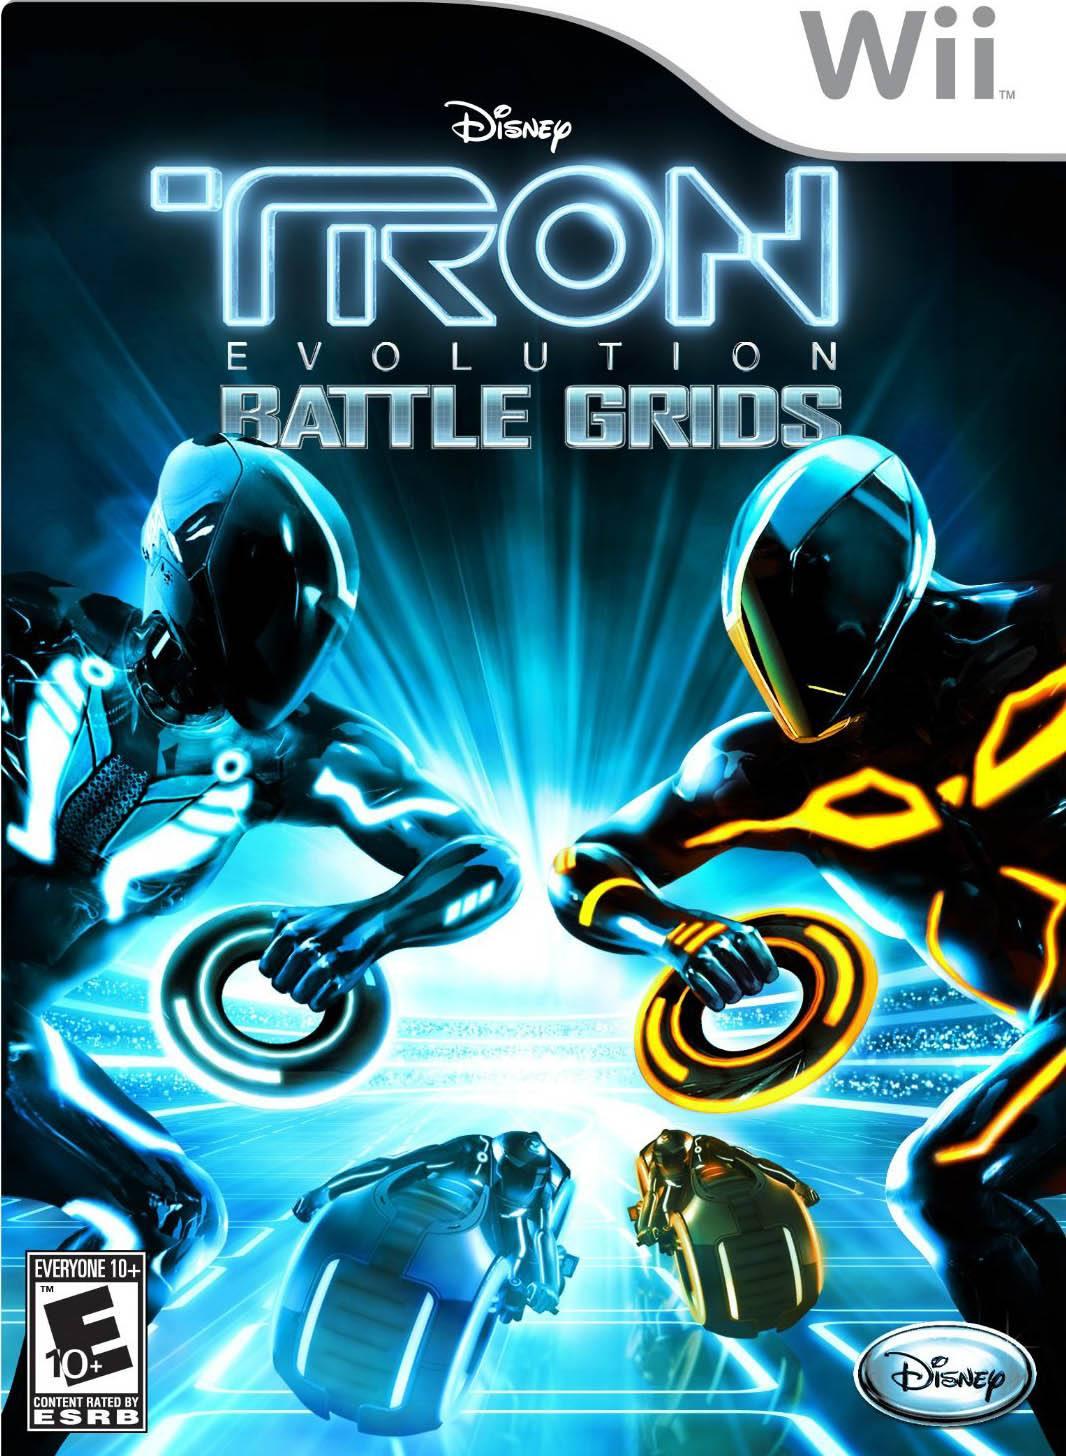 Tron evolution free download pc game full version setup.